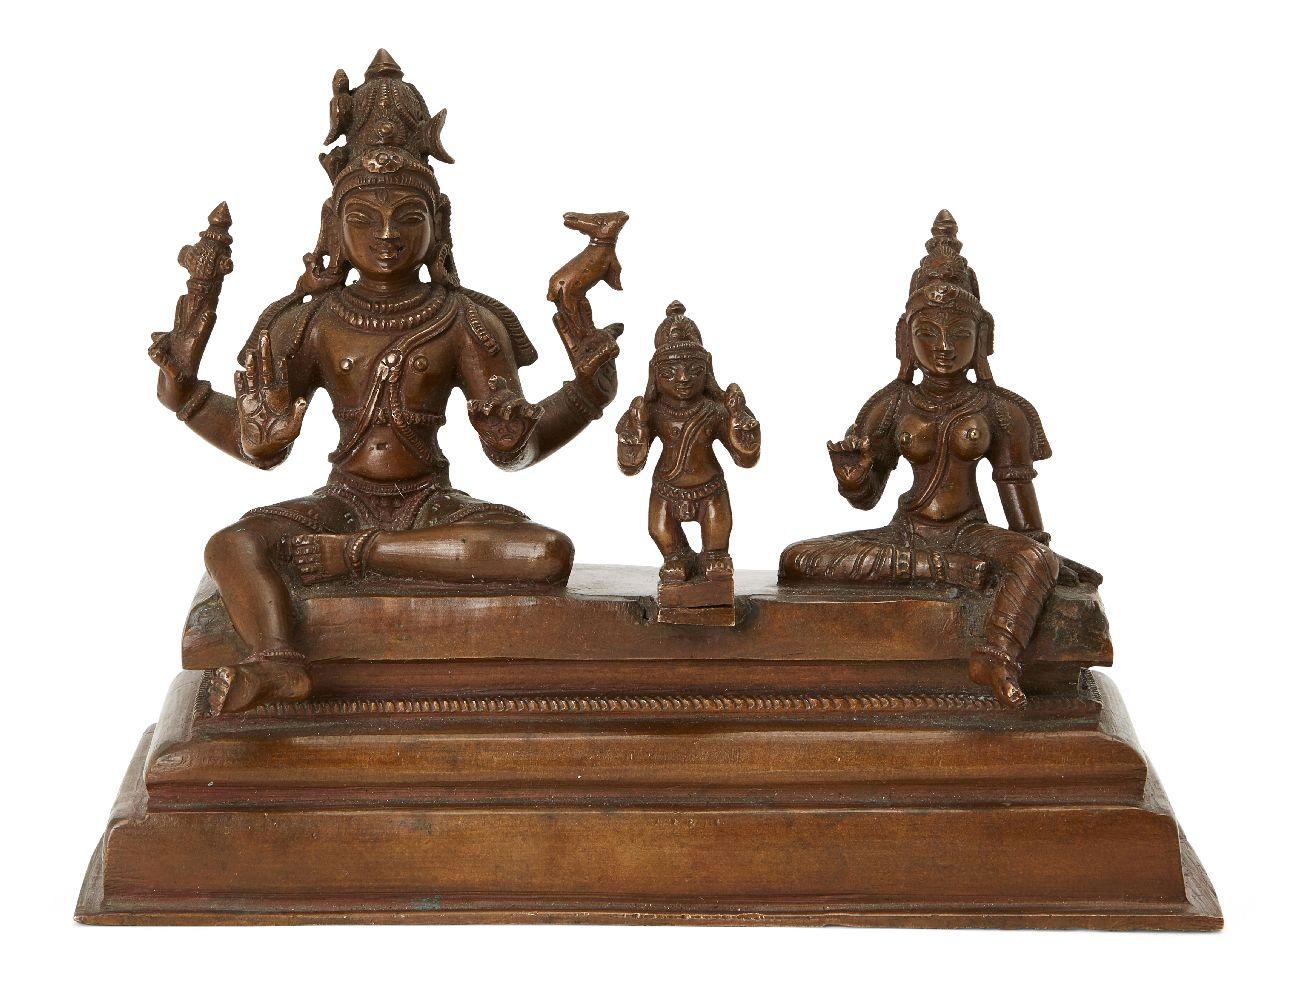 A Tamil Nadu copper figural group of Shiva, Parvati and Skanda (Somaskanda), South India, 19th